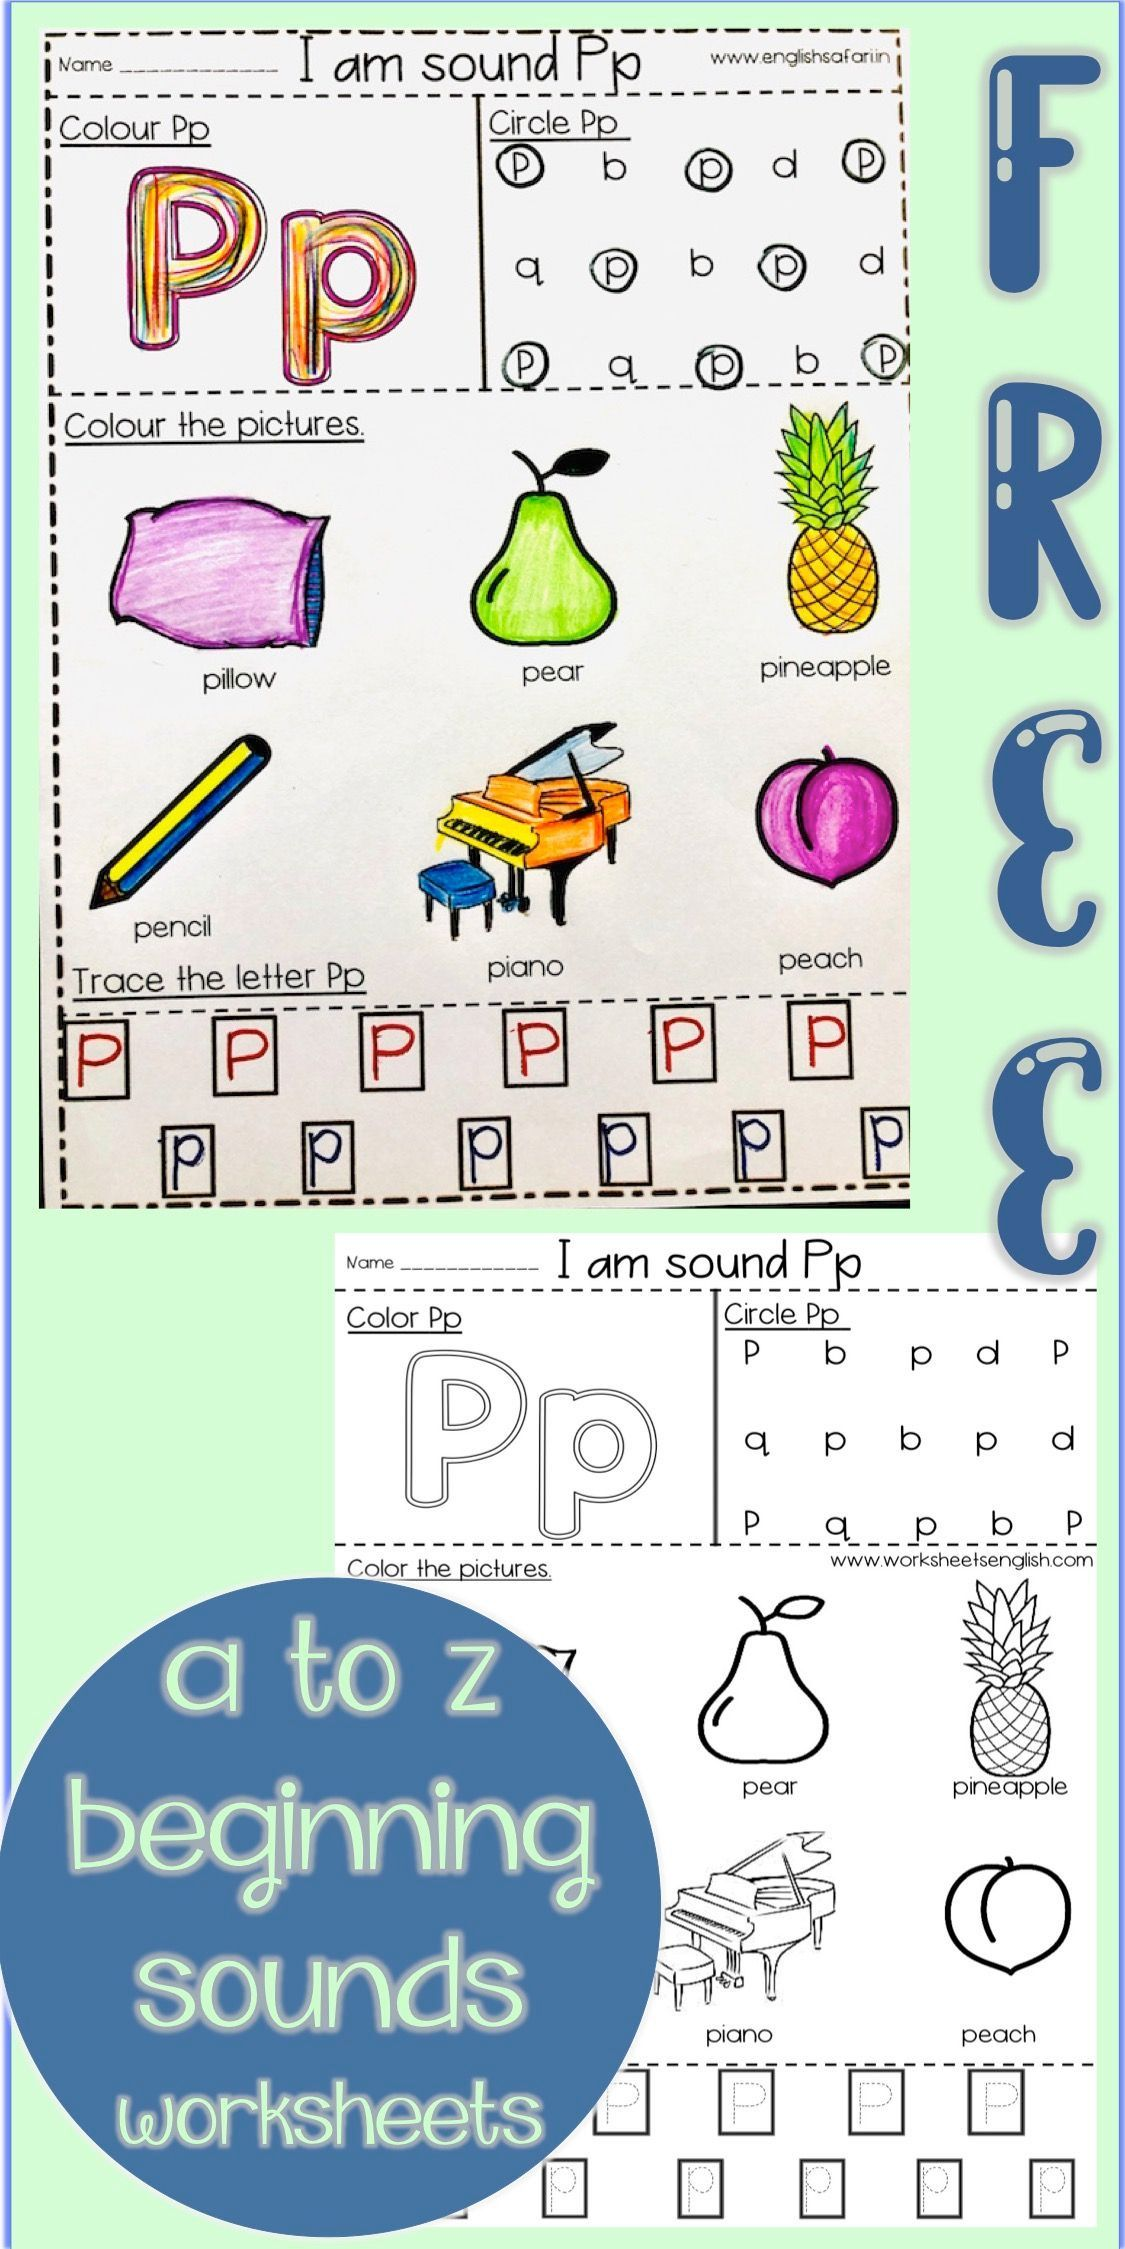 Beginning Sounds Worksheet Pack A Z Www Worksheetsenglish Com In 2021 Beginning Sounds Worksheets Beginning Sounds Phonics Sounds [ 2249 x 1125 Pixel ]